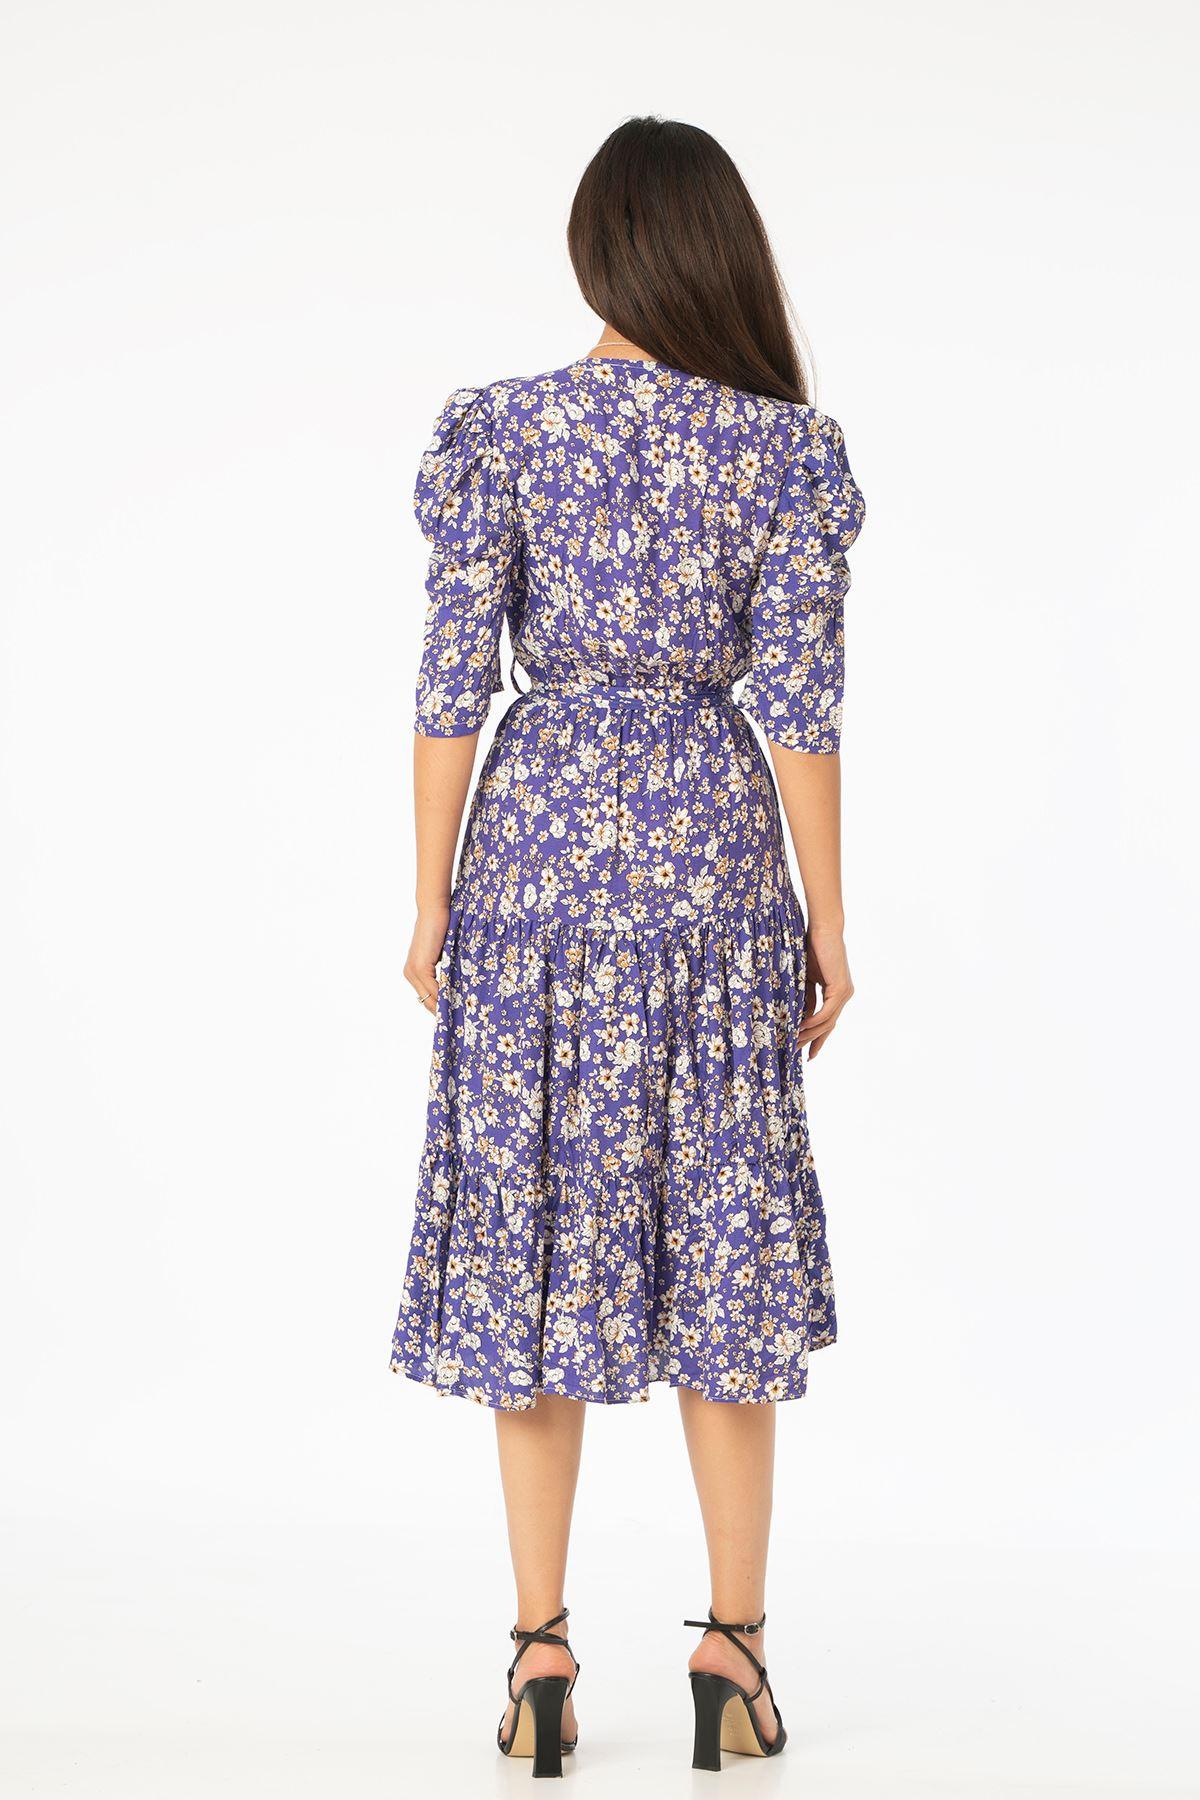 V Yaka Kuşaklı Elbise-Lacivert